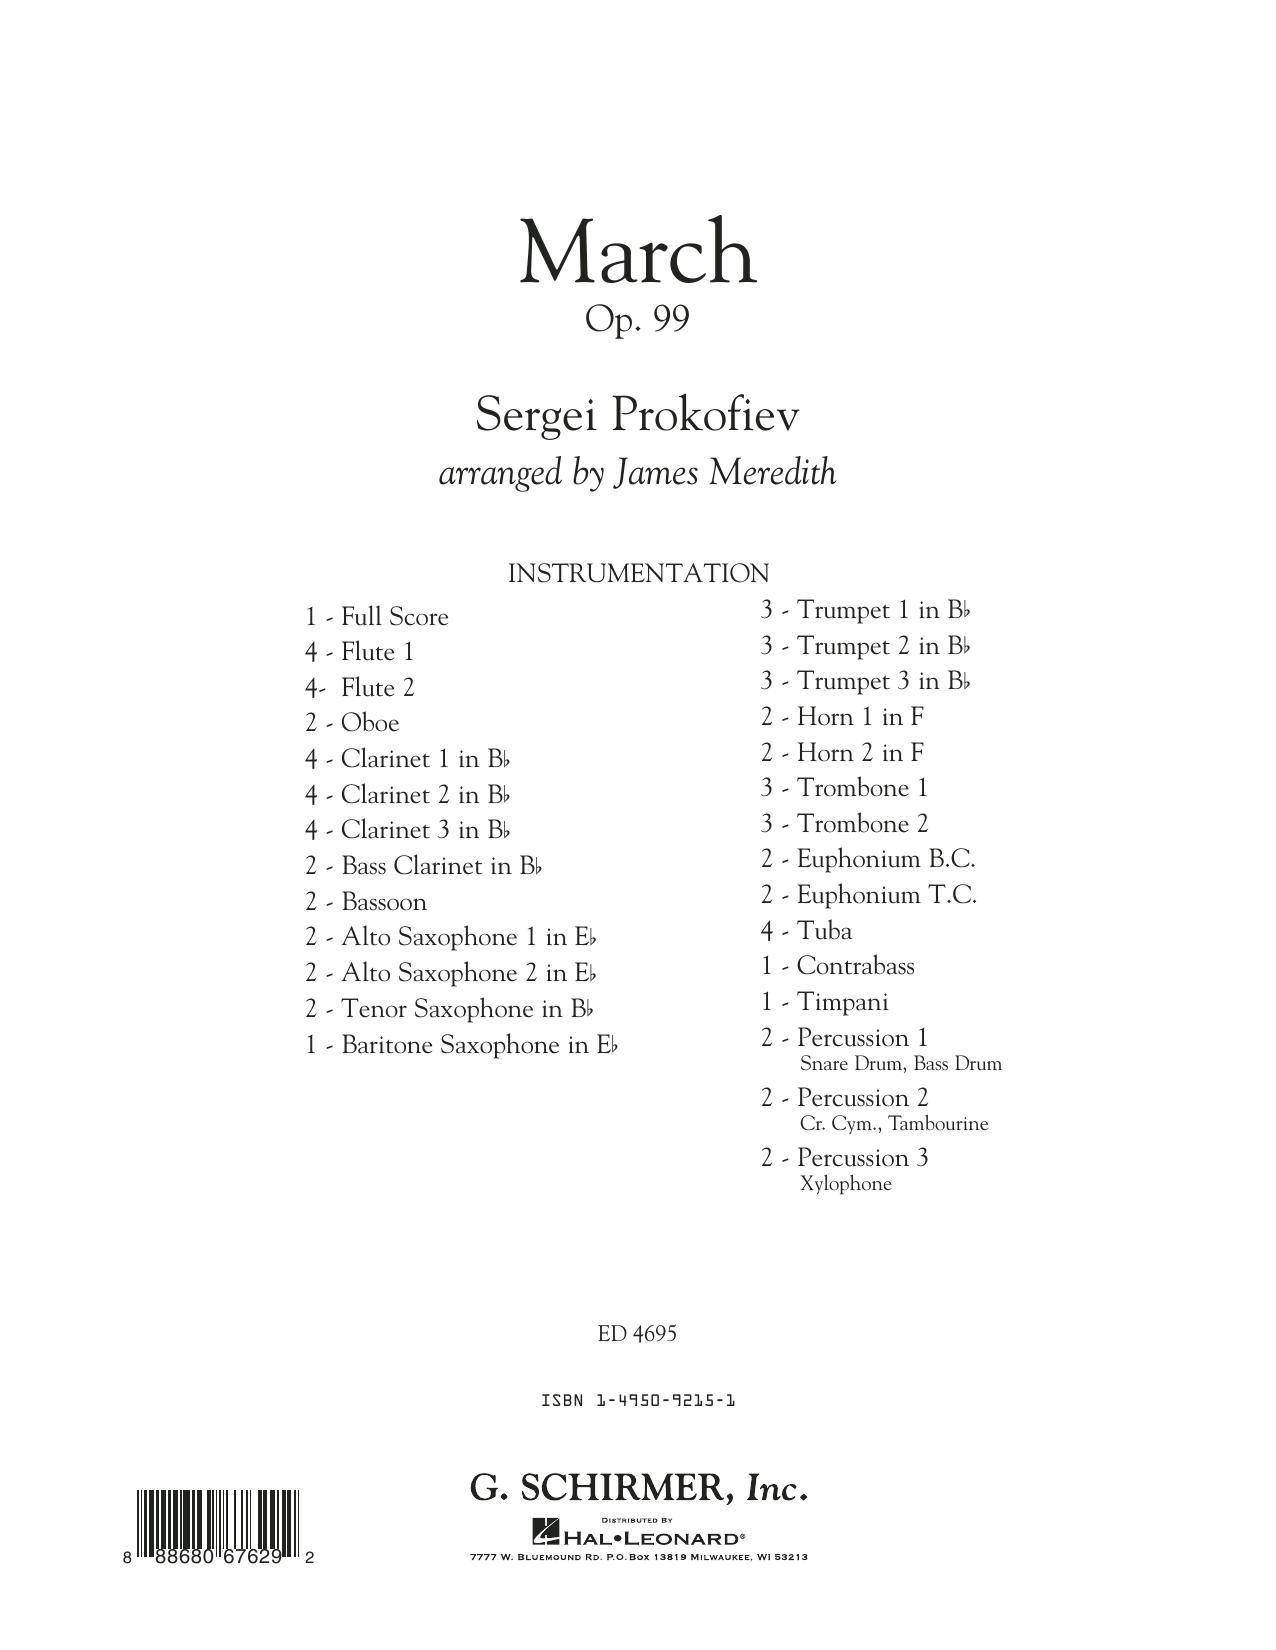 March, Op. 99 - Conductor Score (Full Score) Sheet Music